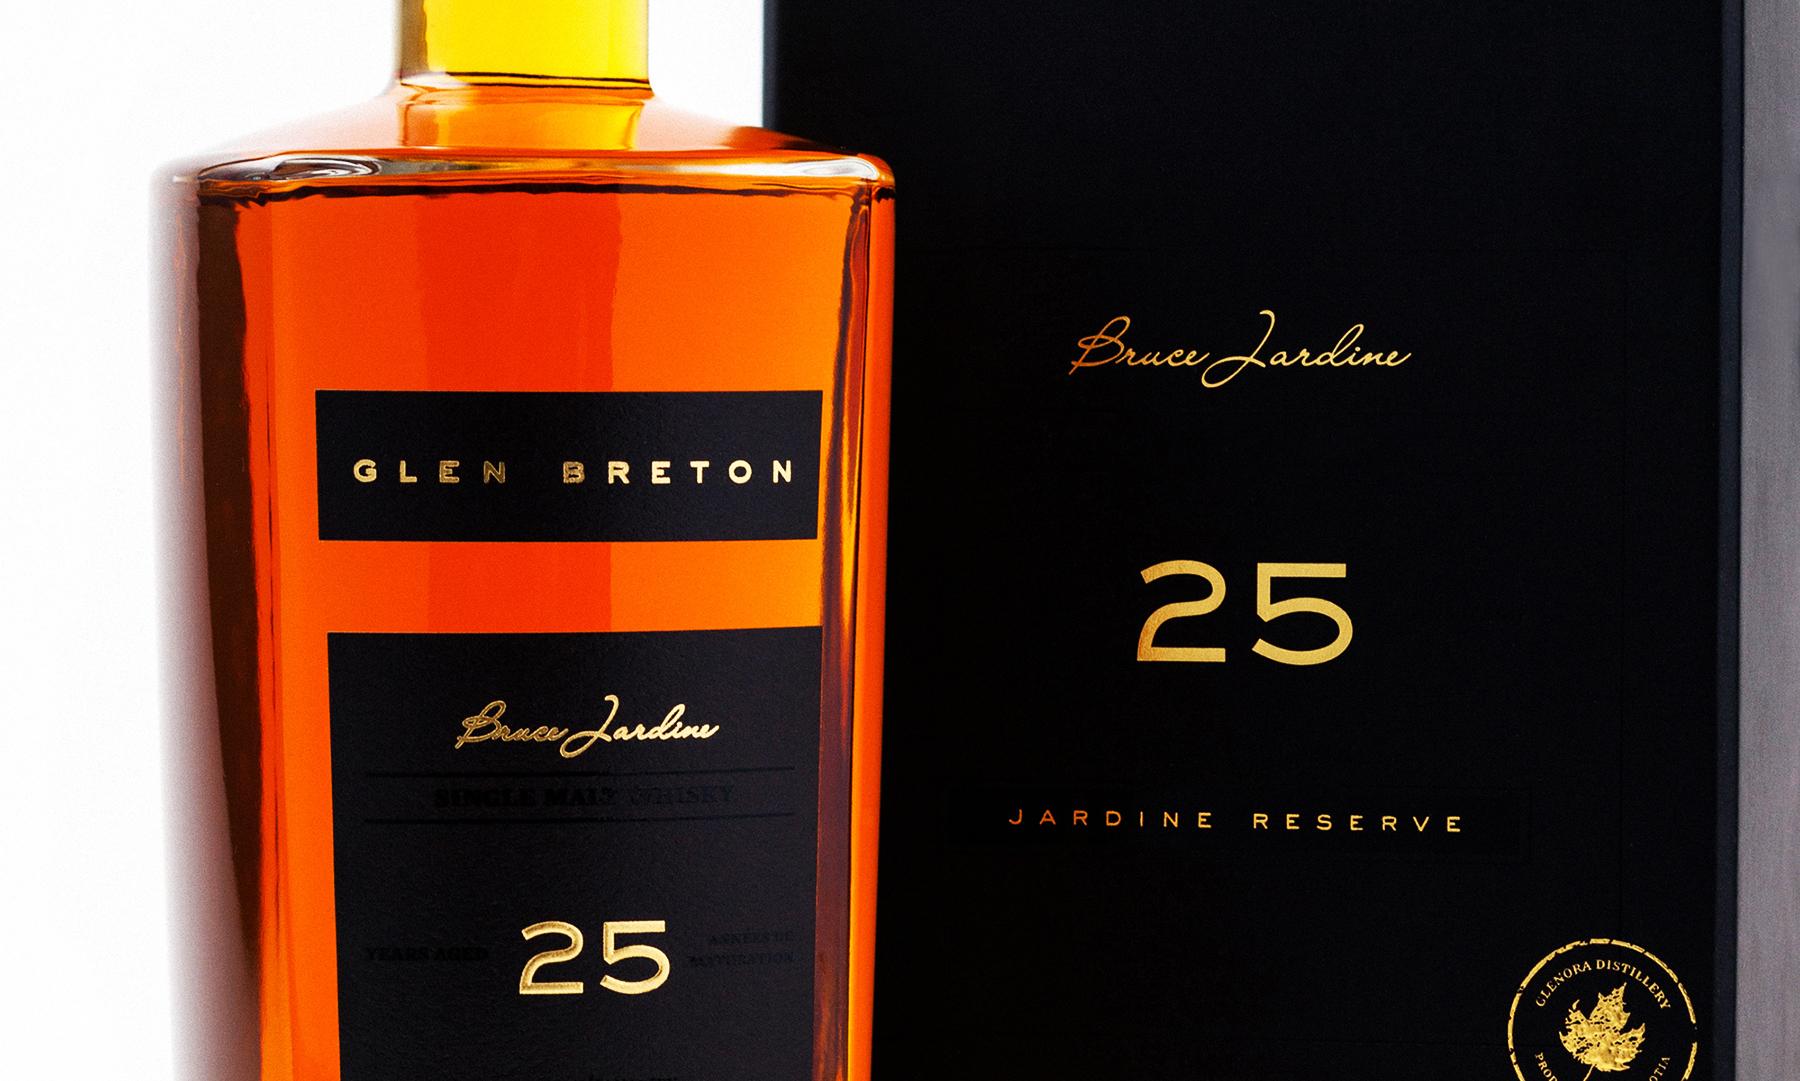 Gle Breton 25